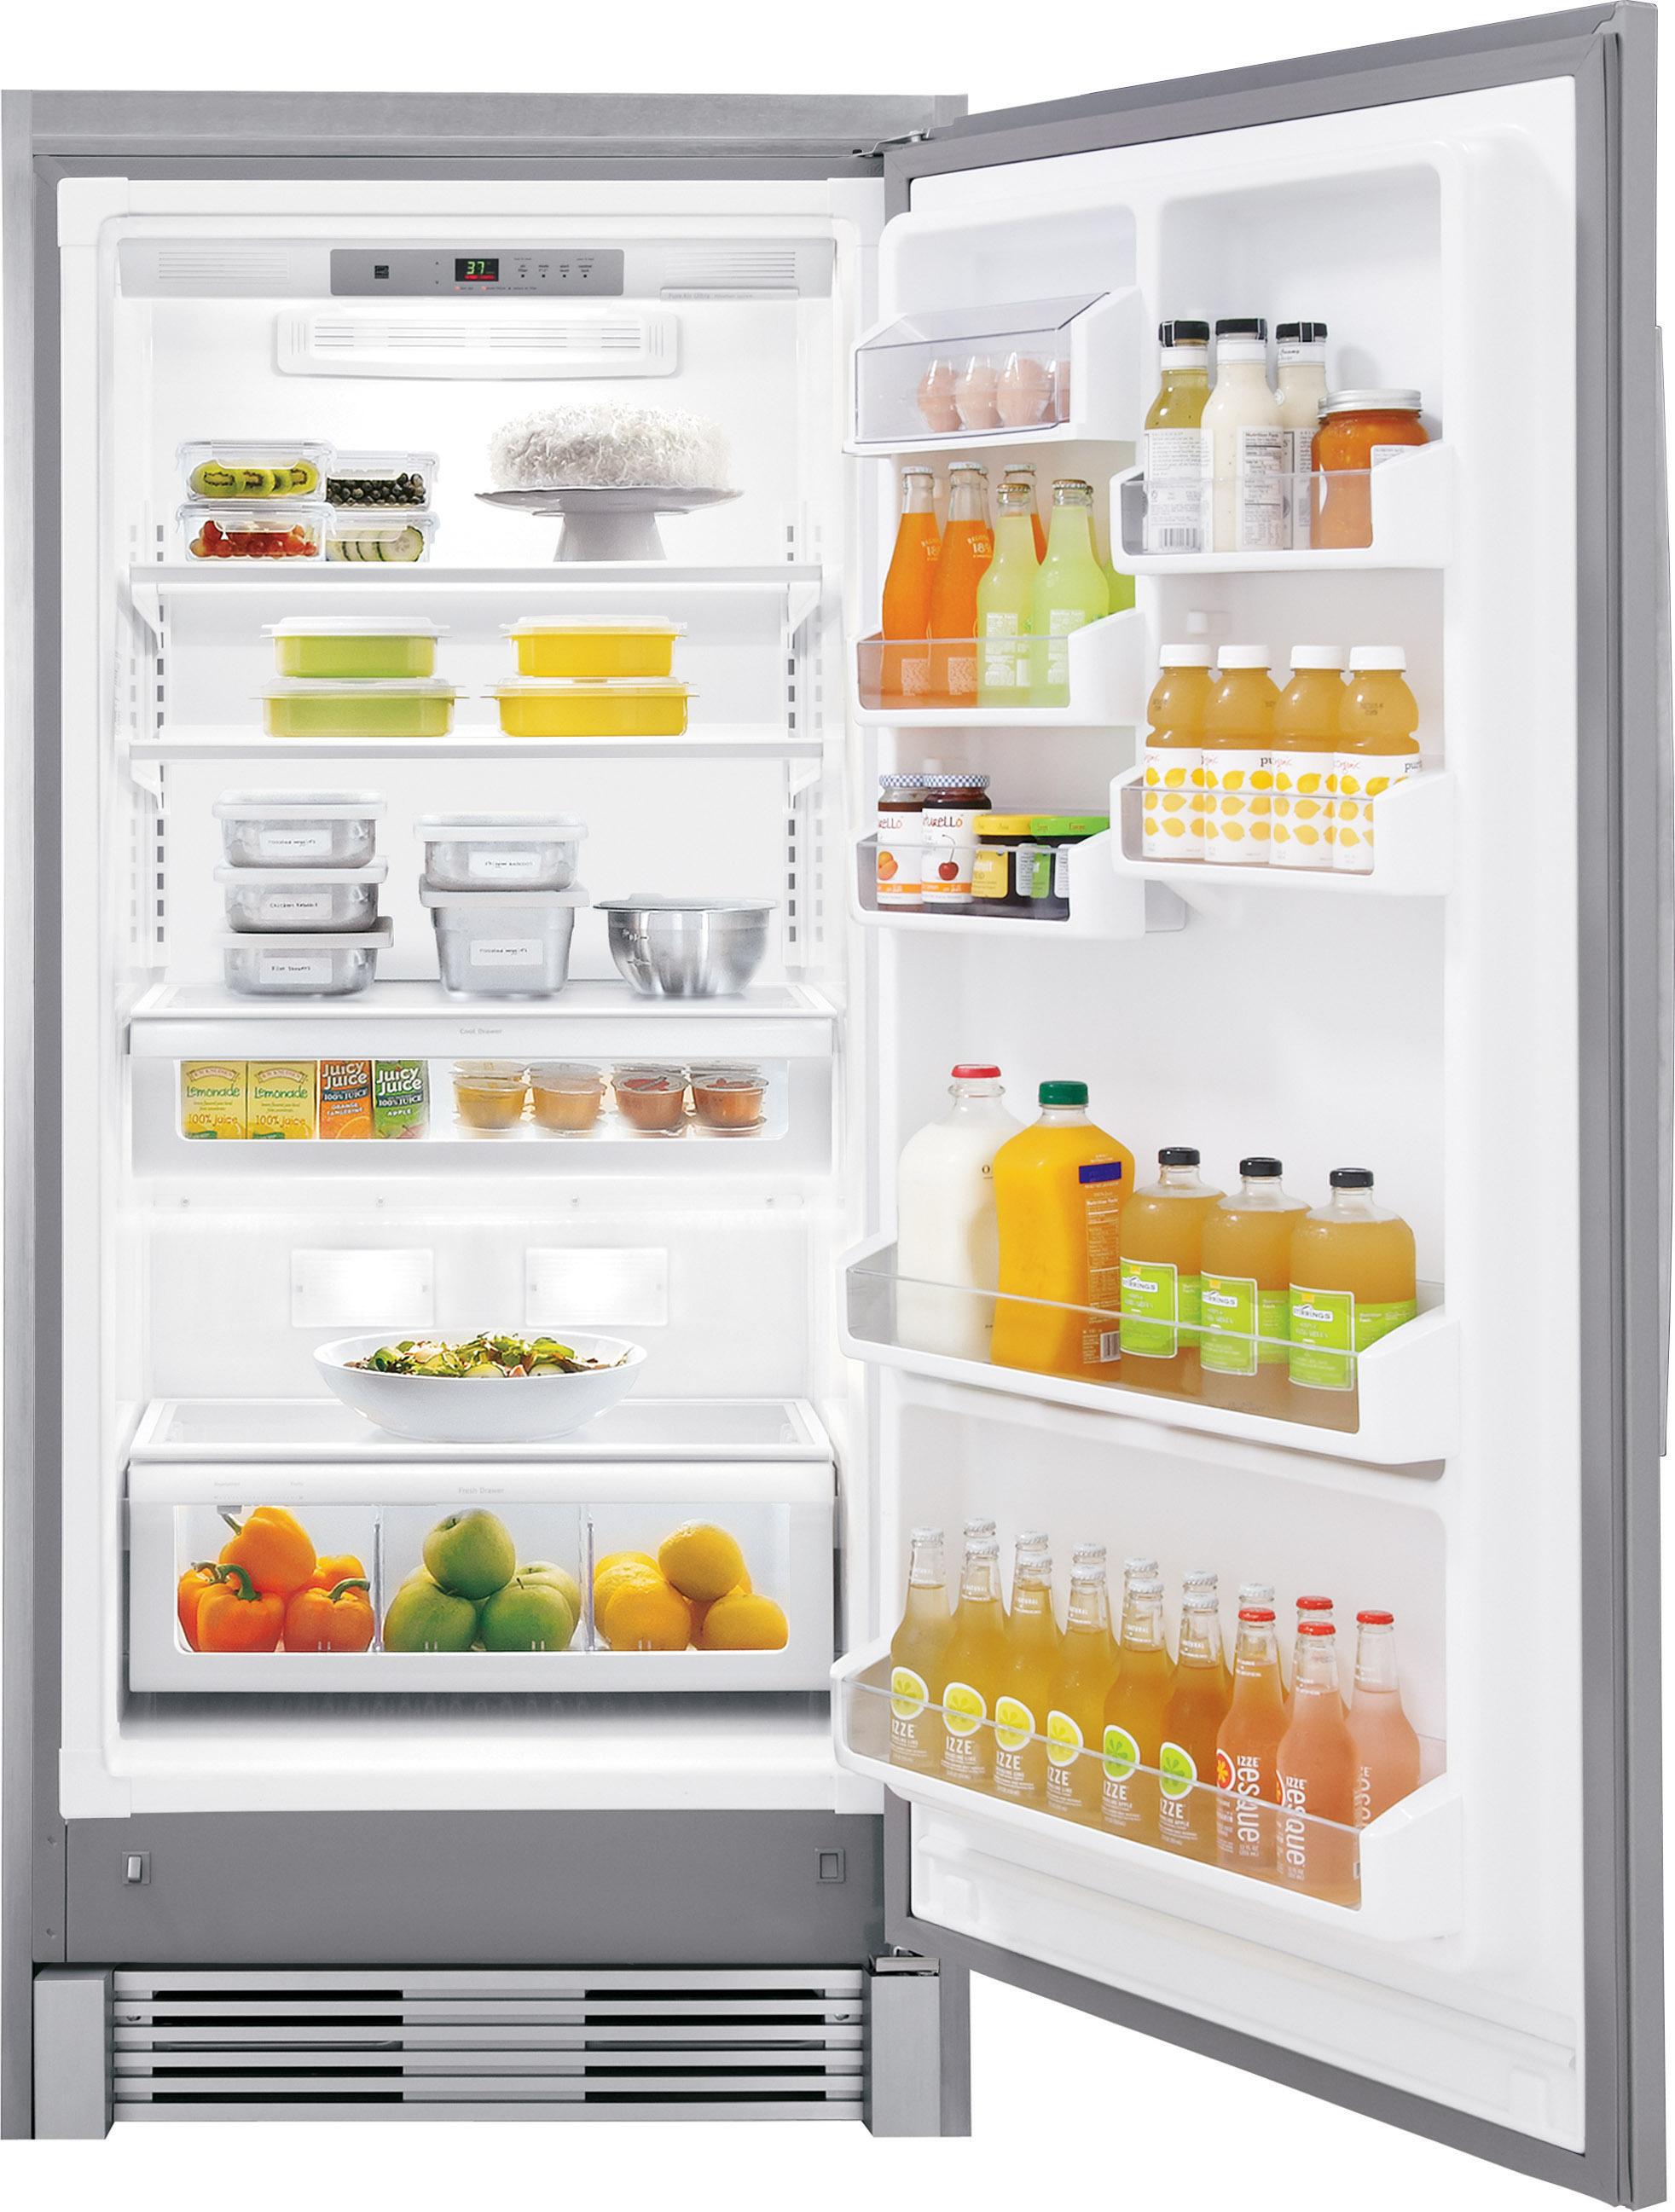 Frigidaire Gallery FGRU19F6QF 18.6 cu. ft. Counter-Depth Freezerless Refrigerator - Stainless Steel